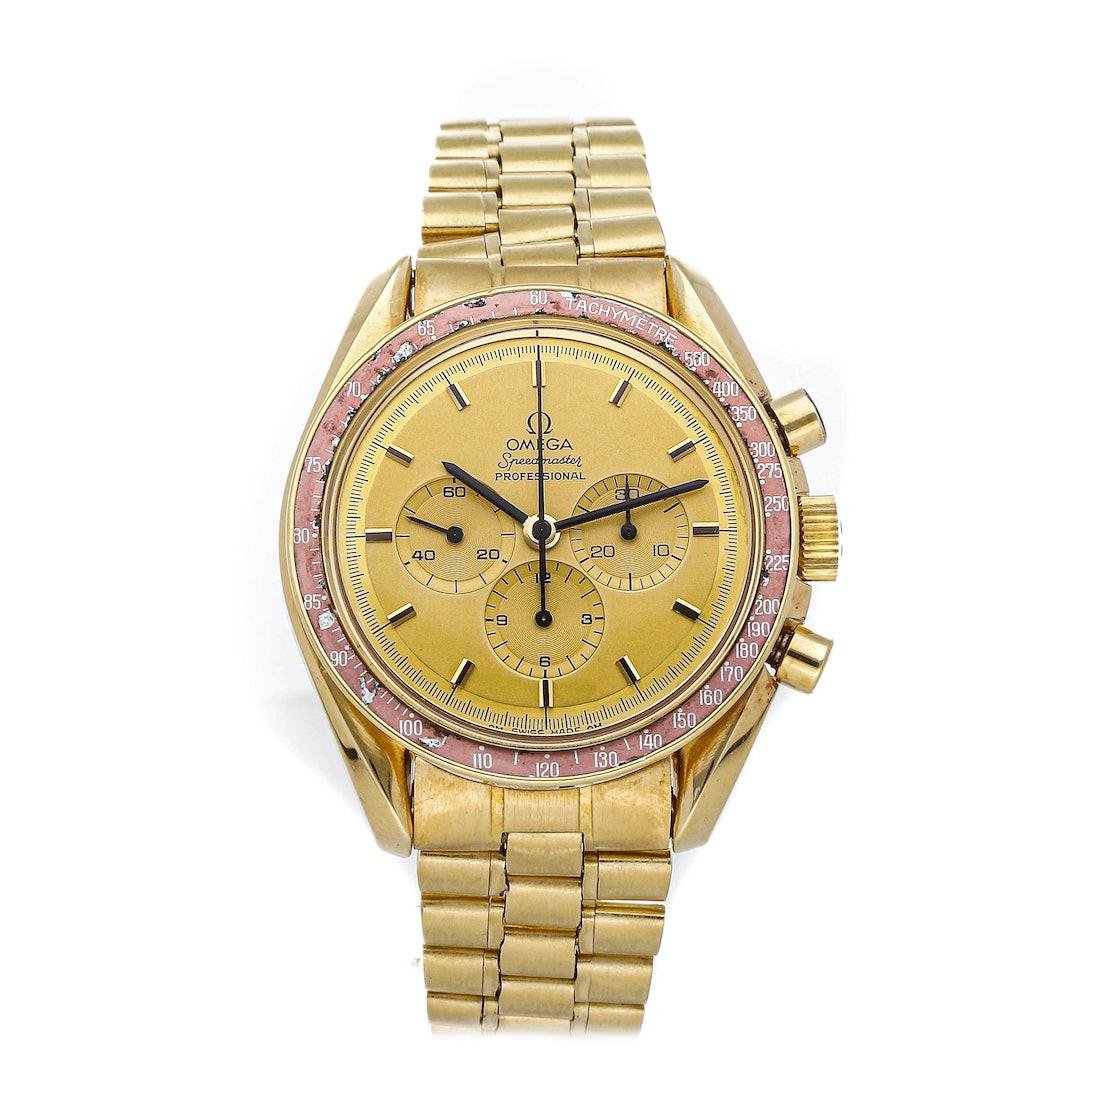 Omega Speedmaster Professional Moonwatch Apollo XI 1969 BA145.022